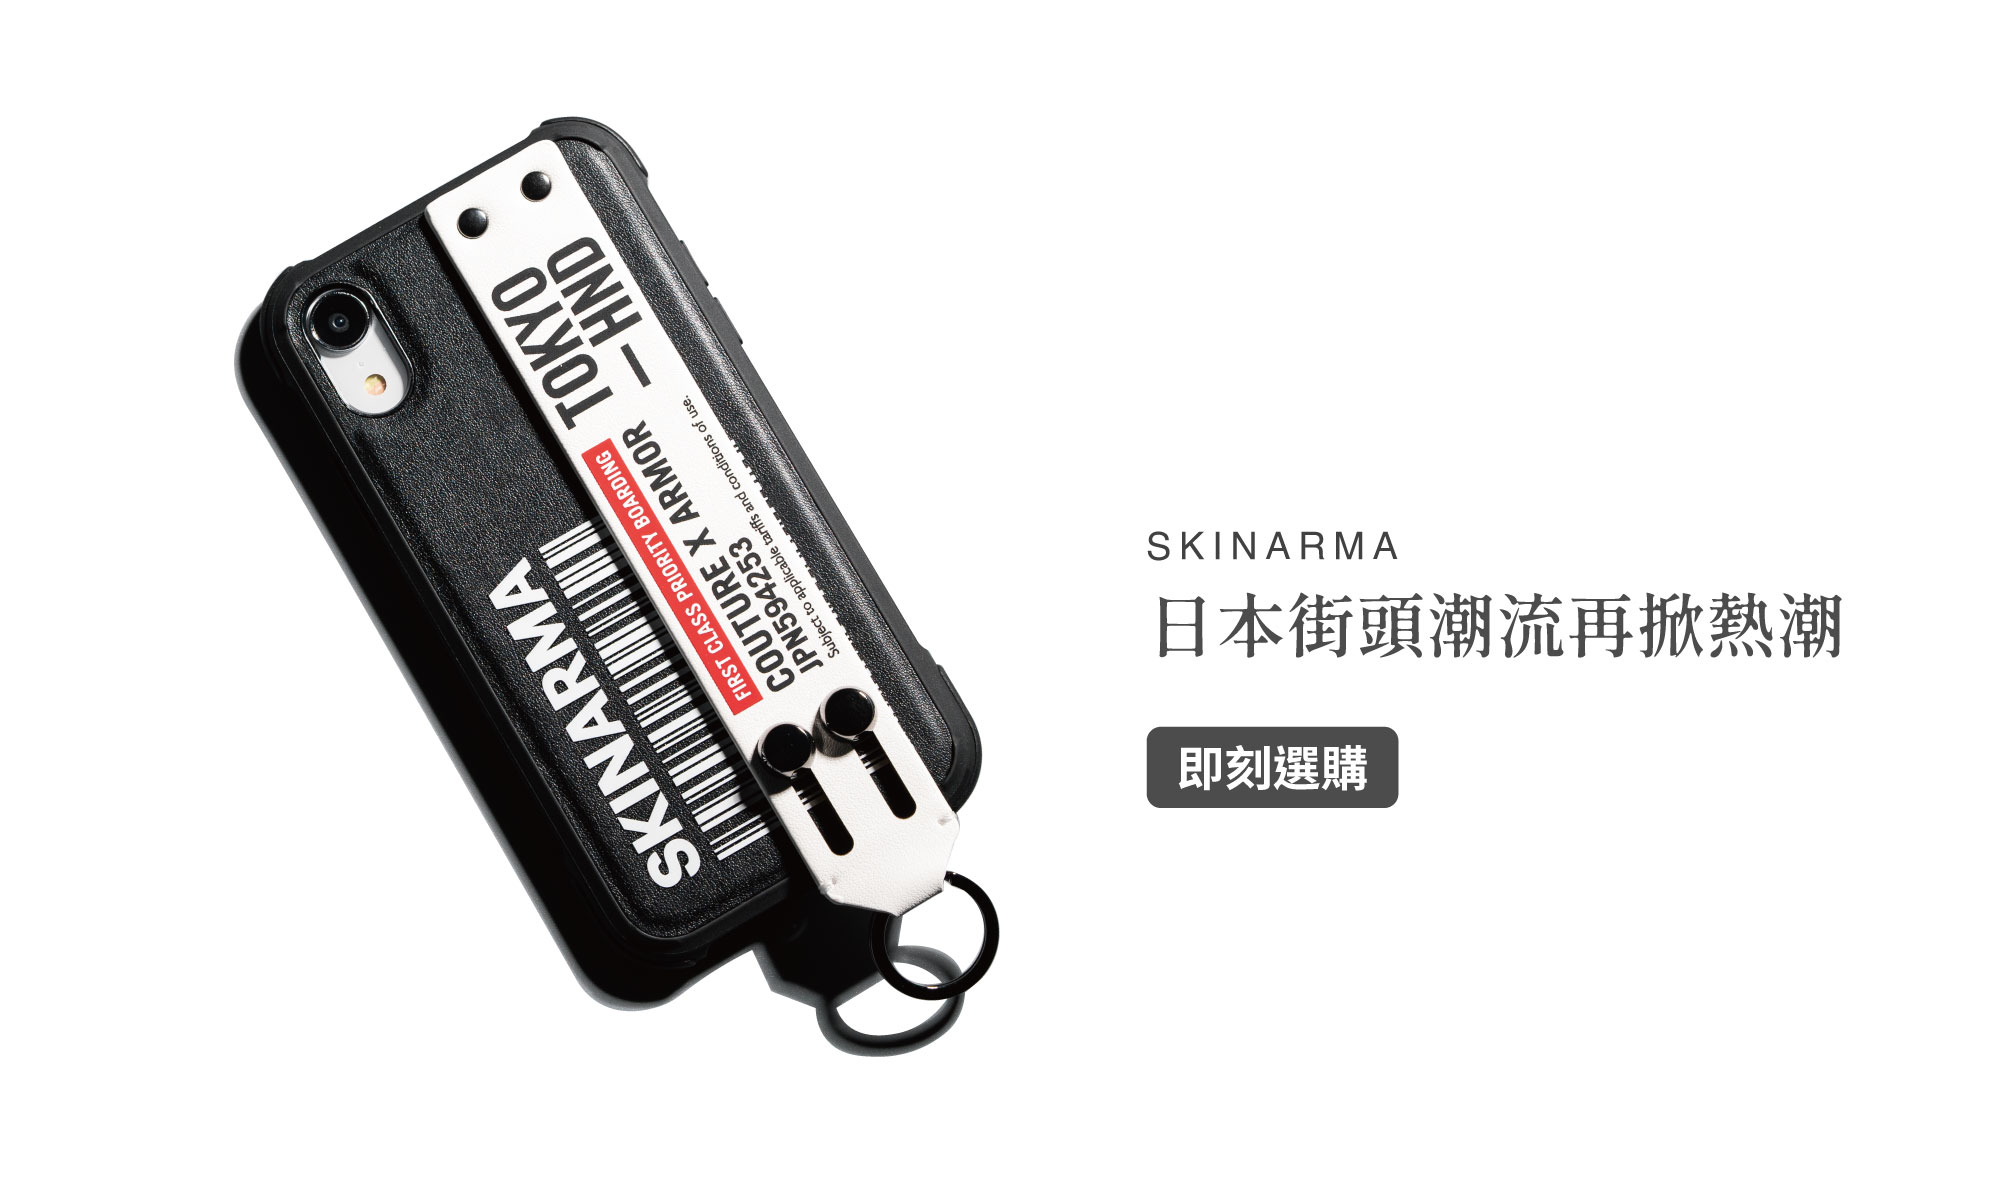 skinarma iphone  手機保護殼